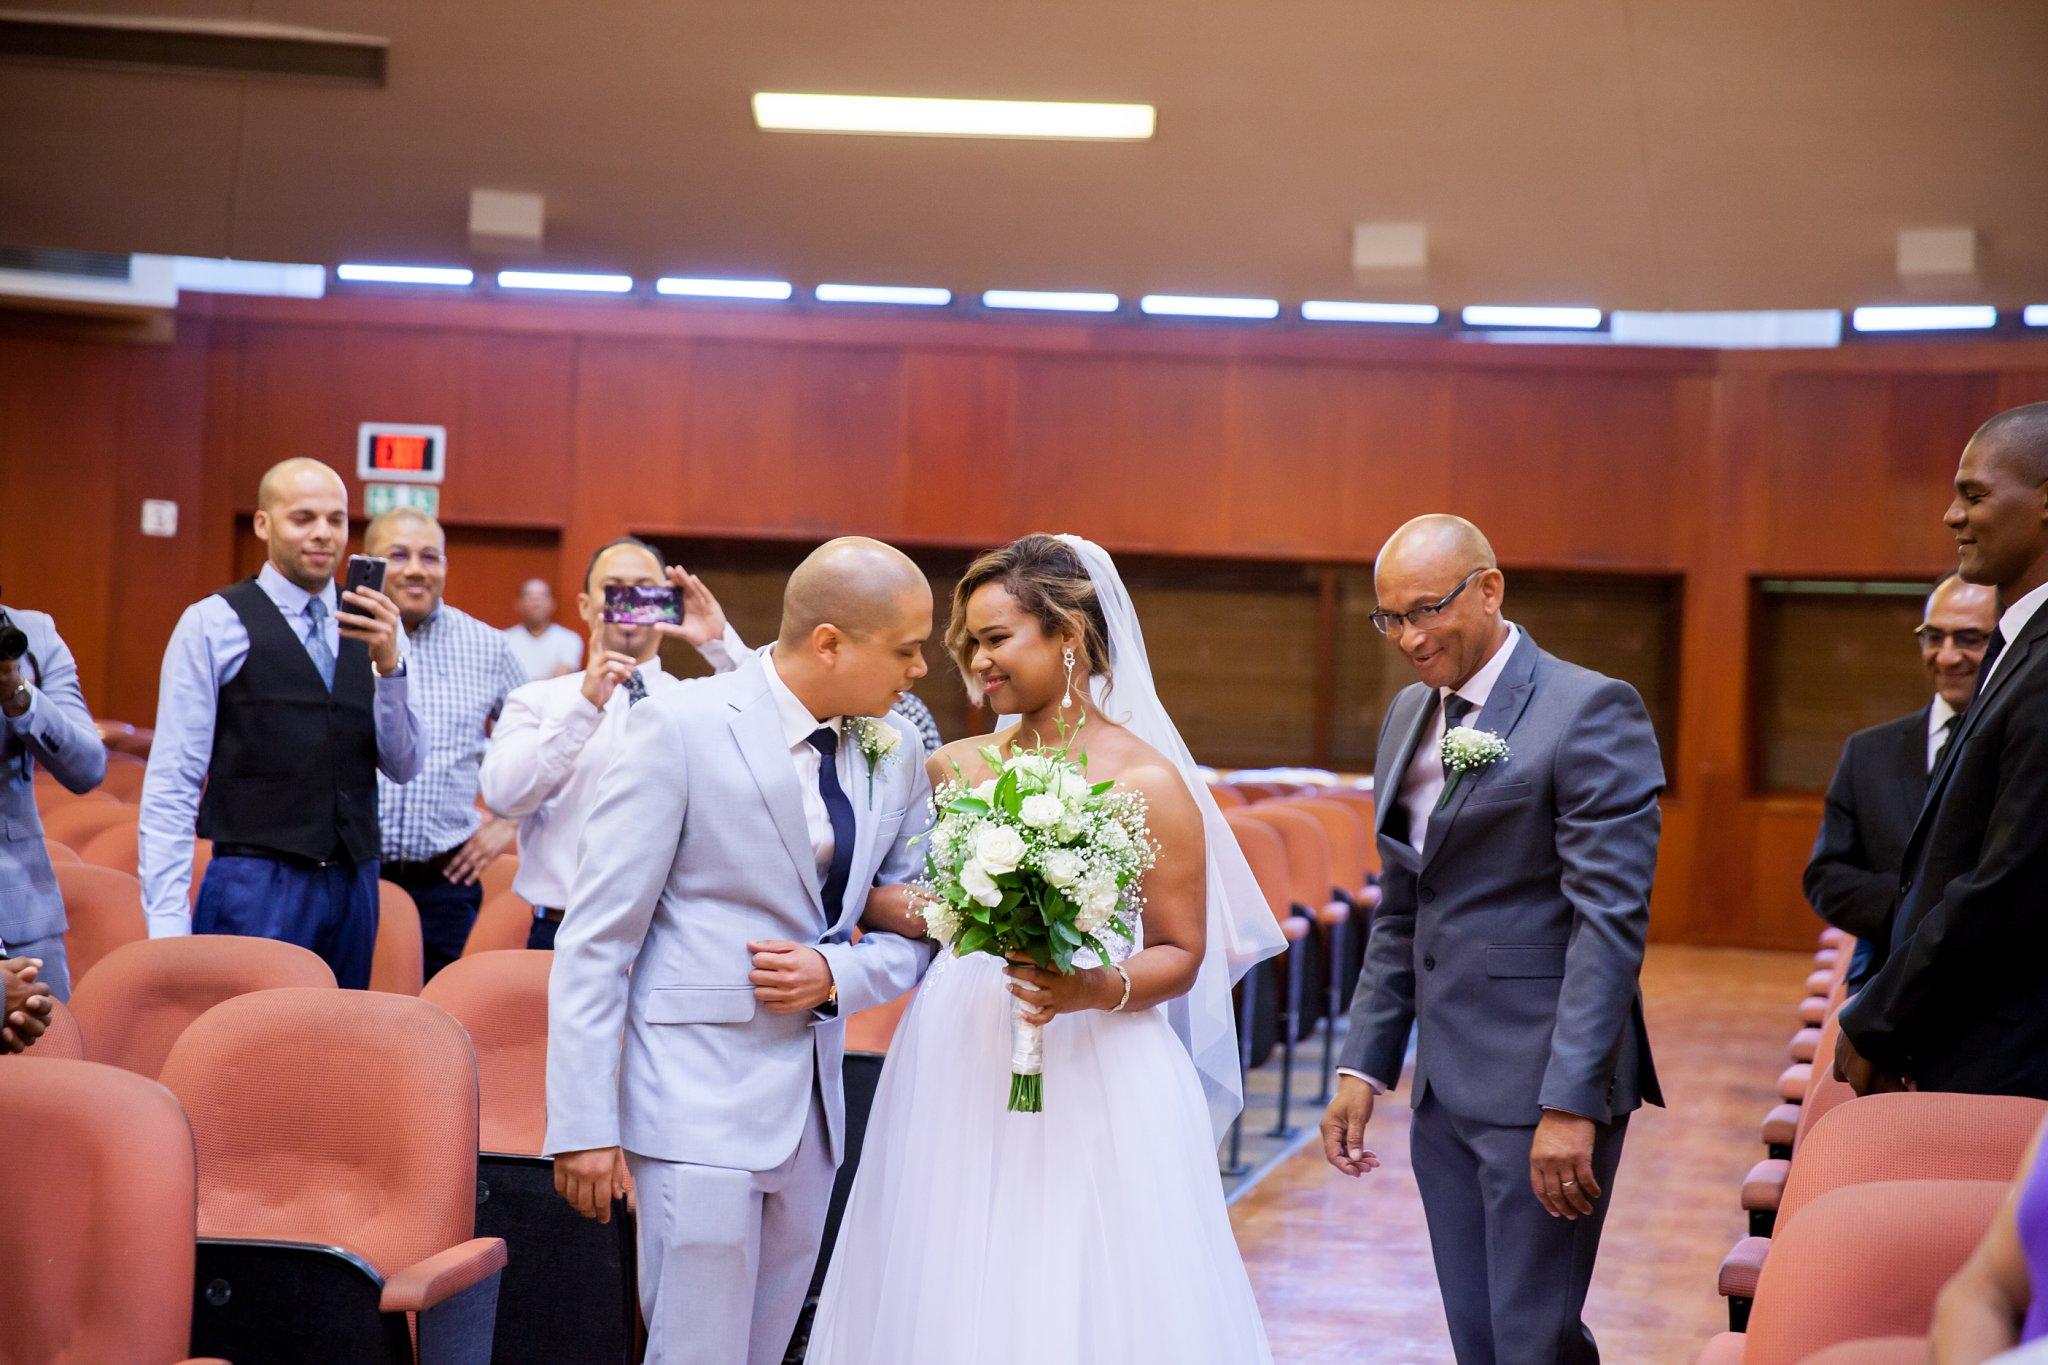 Photography,SamArendse Photography,Wedding,Wedding Photographer,Wedding Photography,